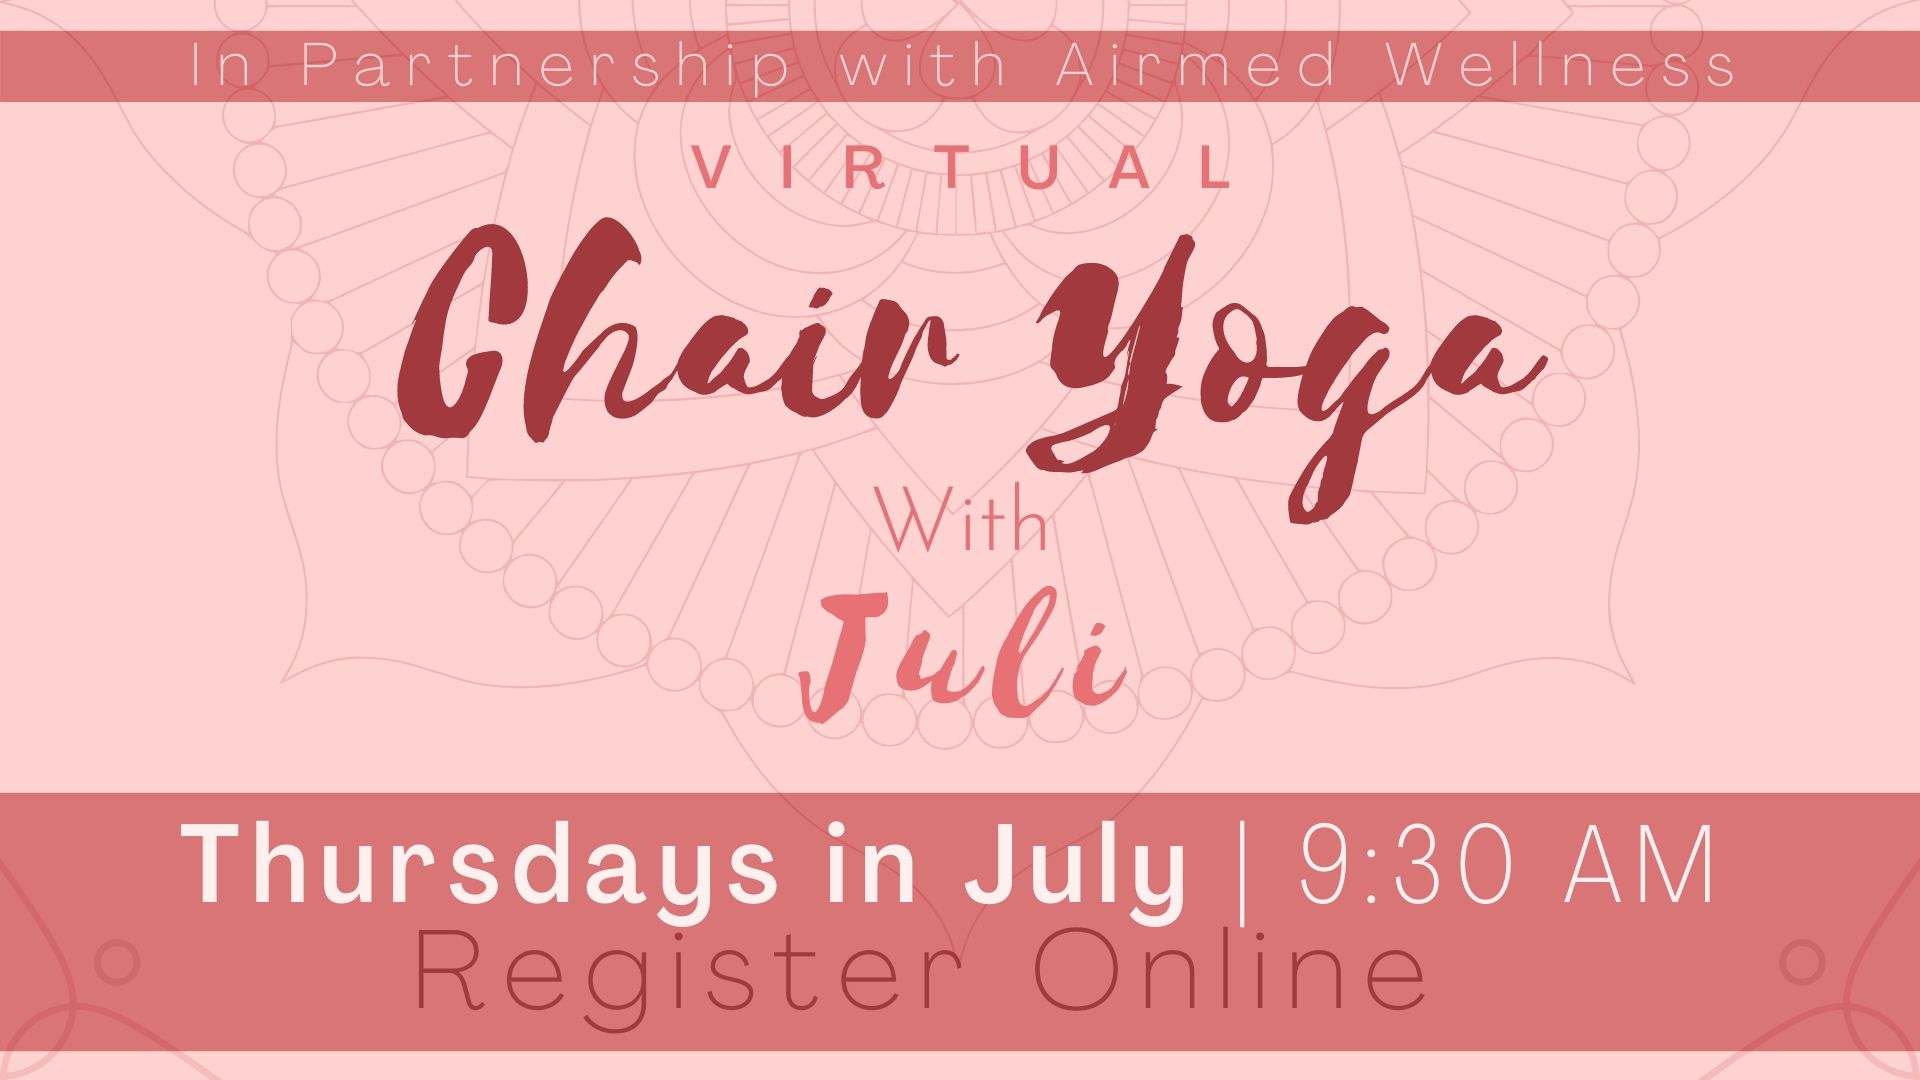 Chair Yoga with Juli (Virtual)